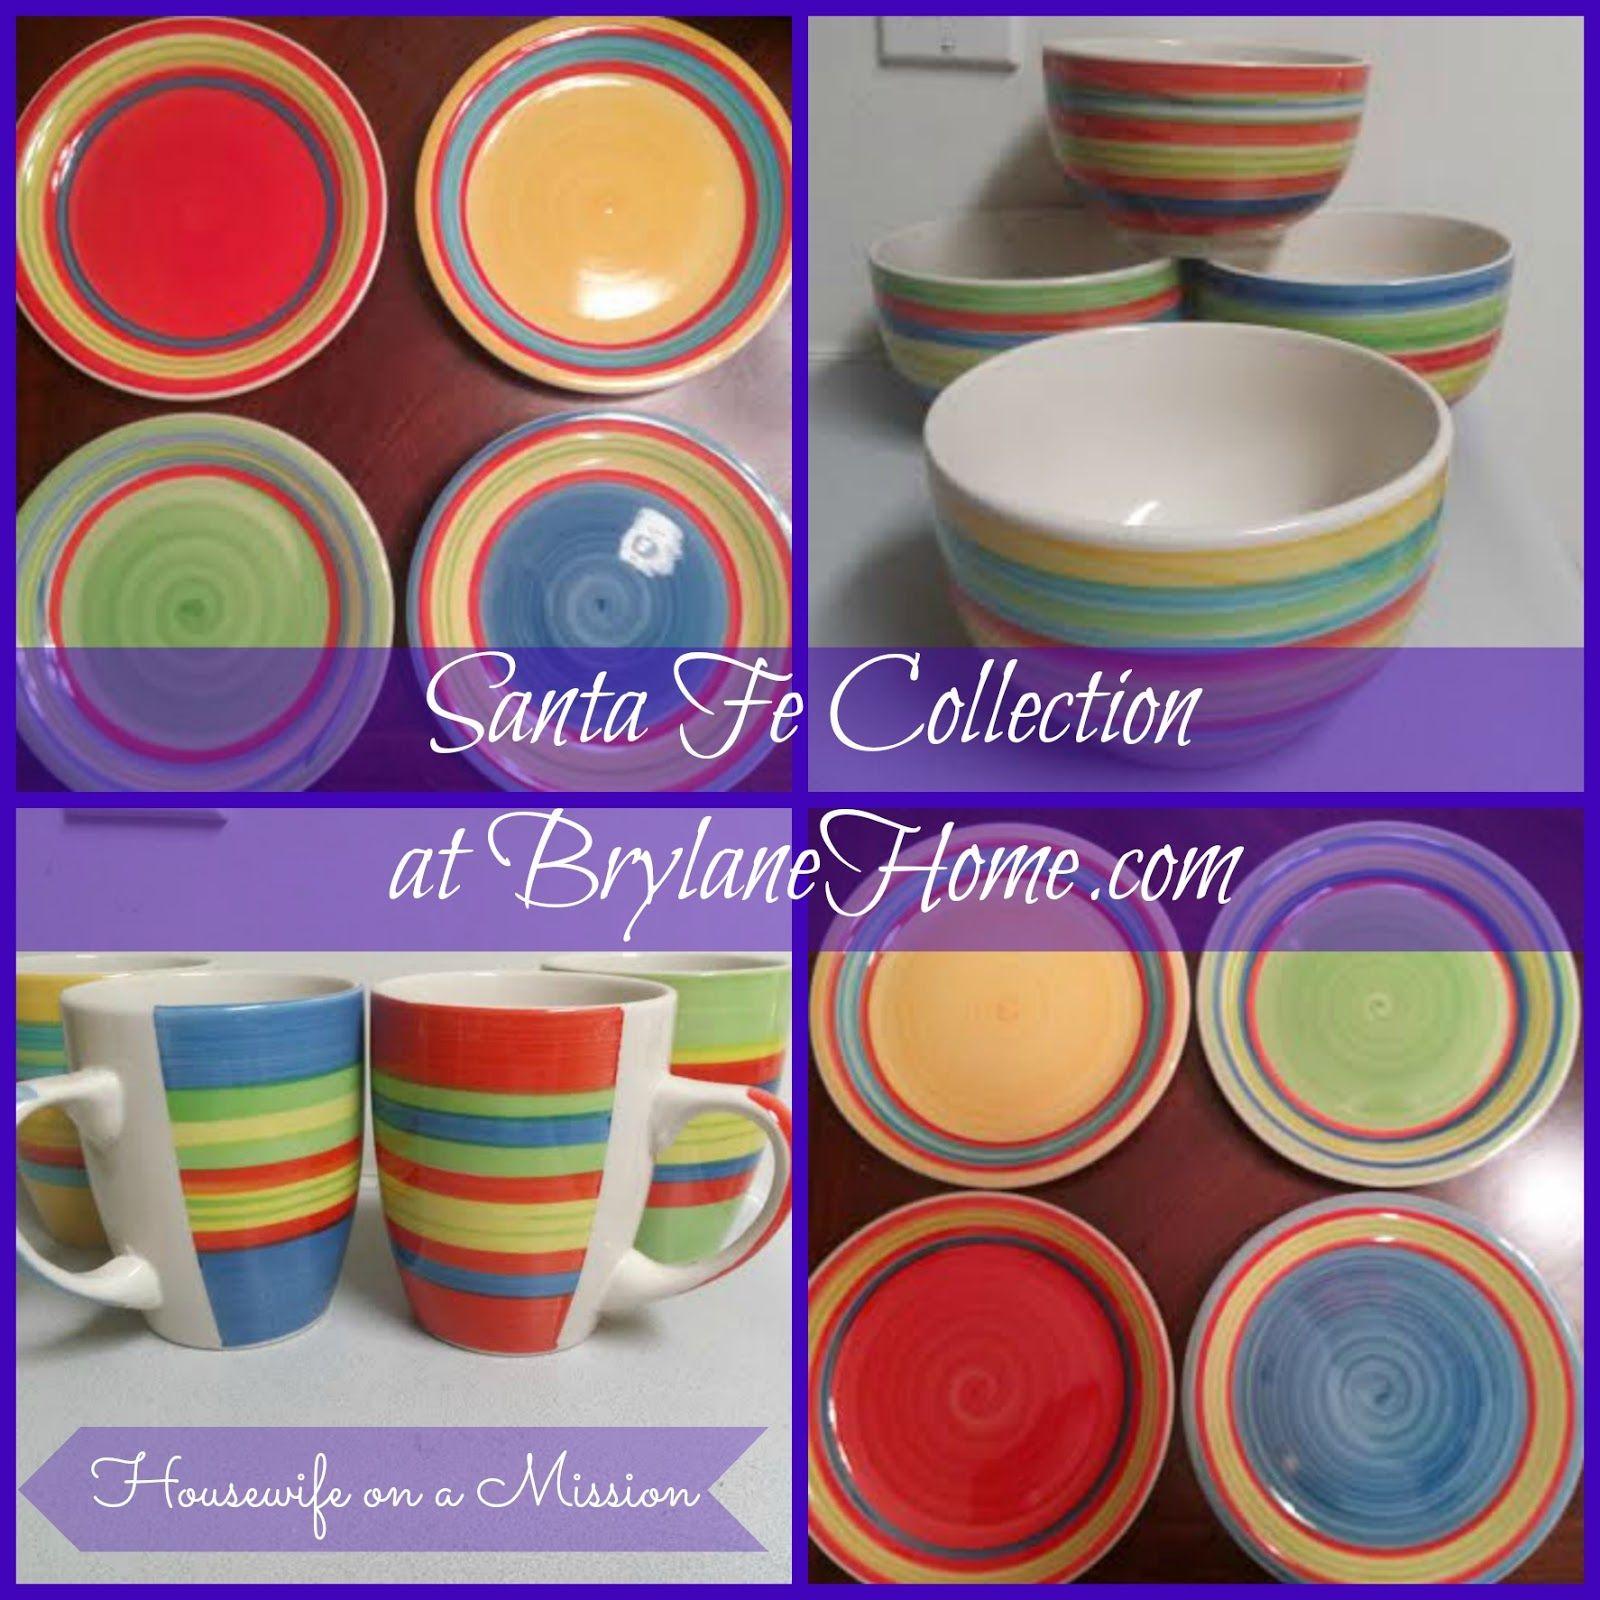 Housewife On A Mission Brylanehome 39 S 16 Piece Santa Fe Dinnerware Dinnerware Fes Santa Fe